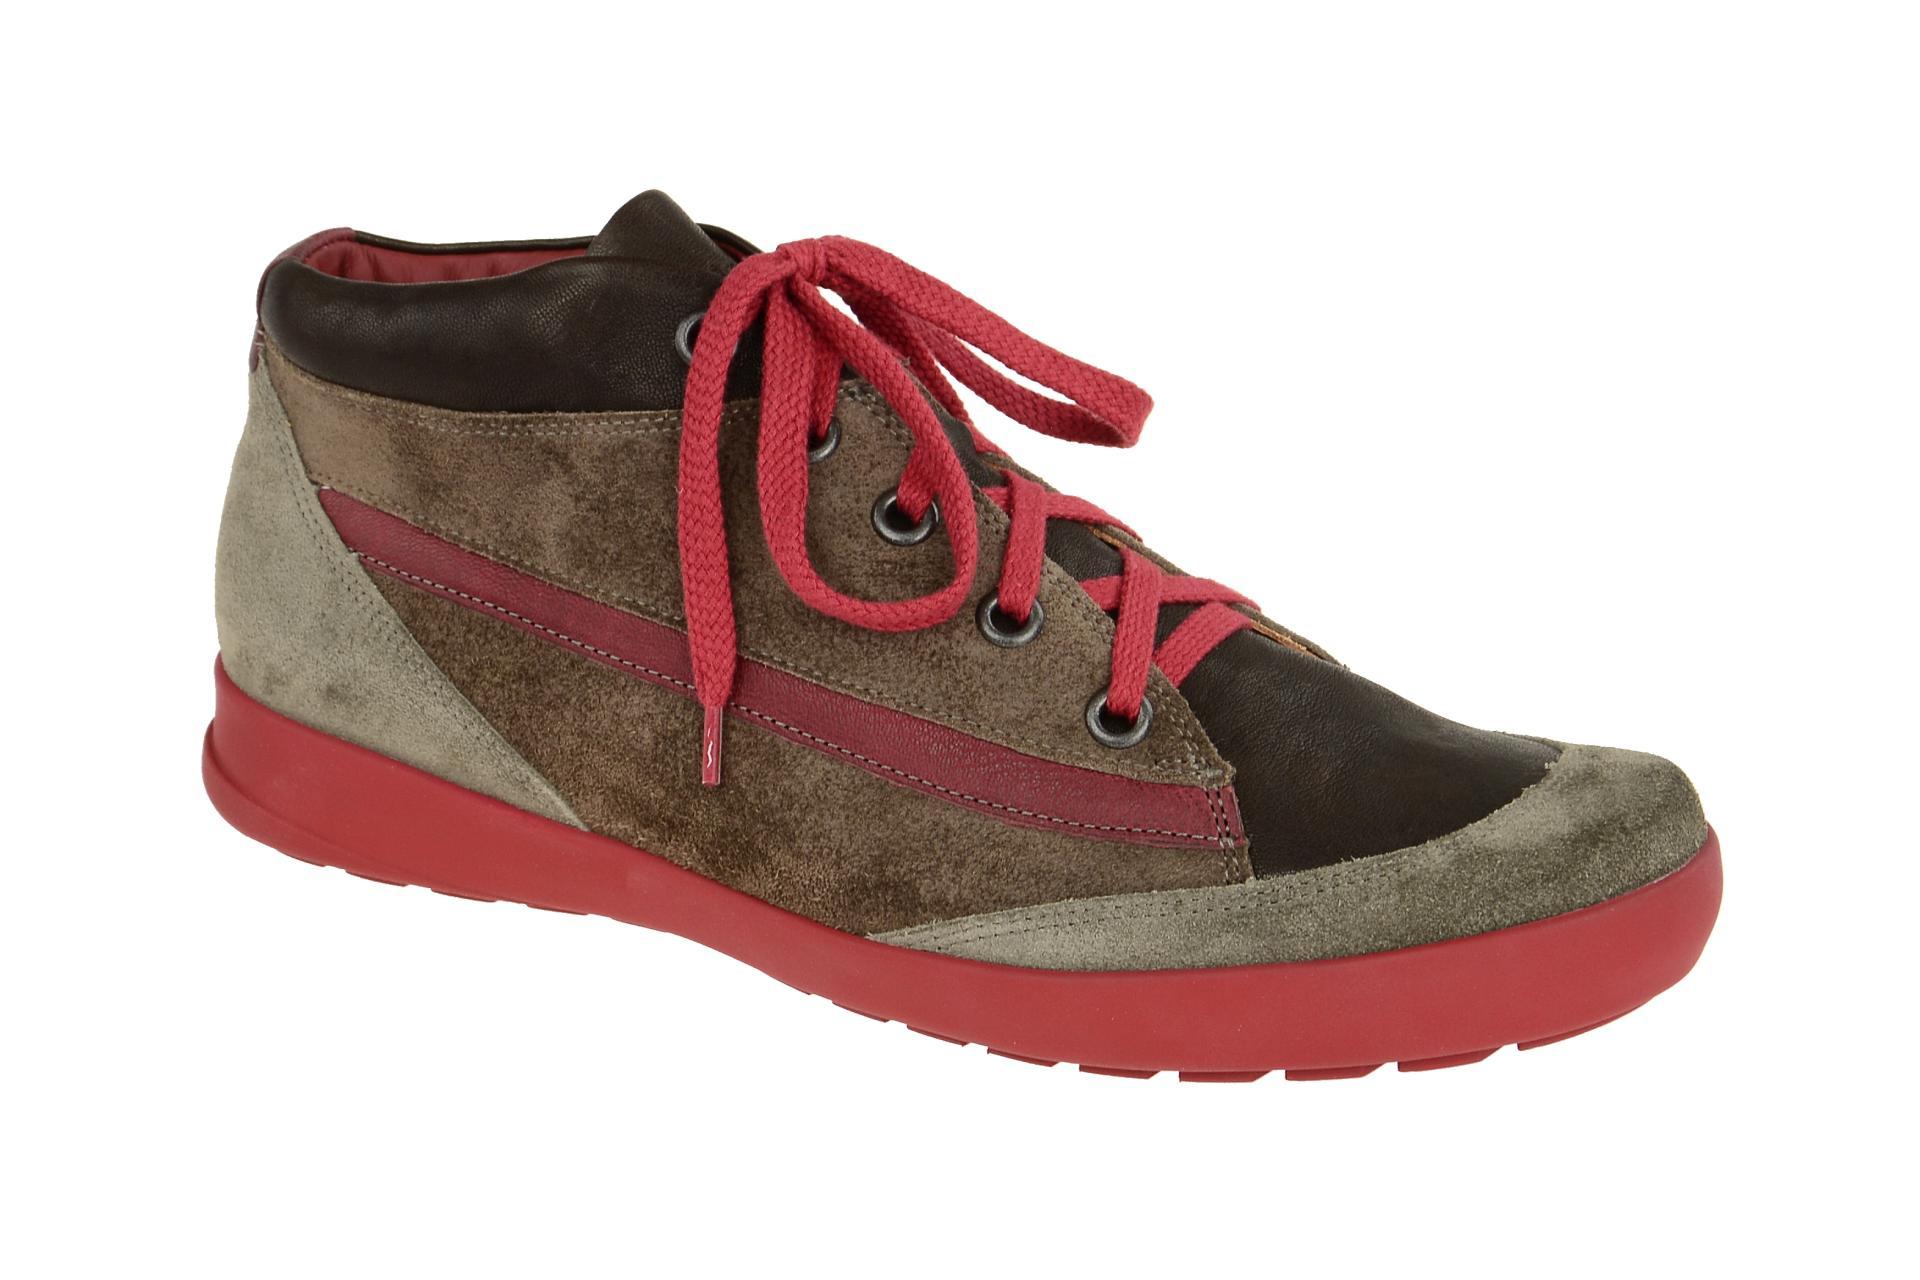 new product e9c2c 4cd58 Details zu Think Schuhe ZAGG braun Herrenschuhe Mid cut Sneaker 1-81602-21  NEU